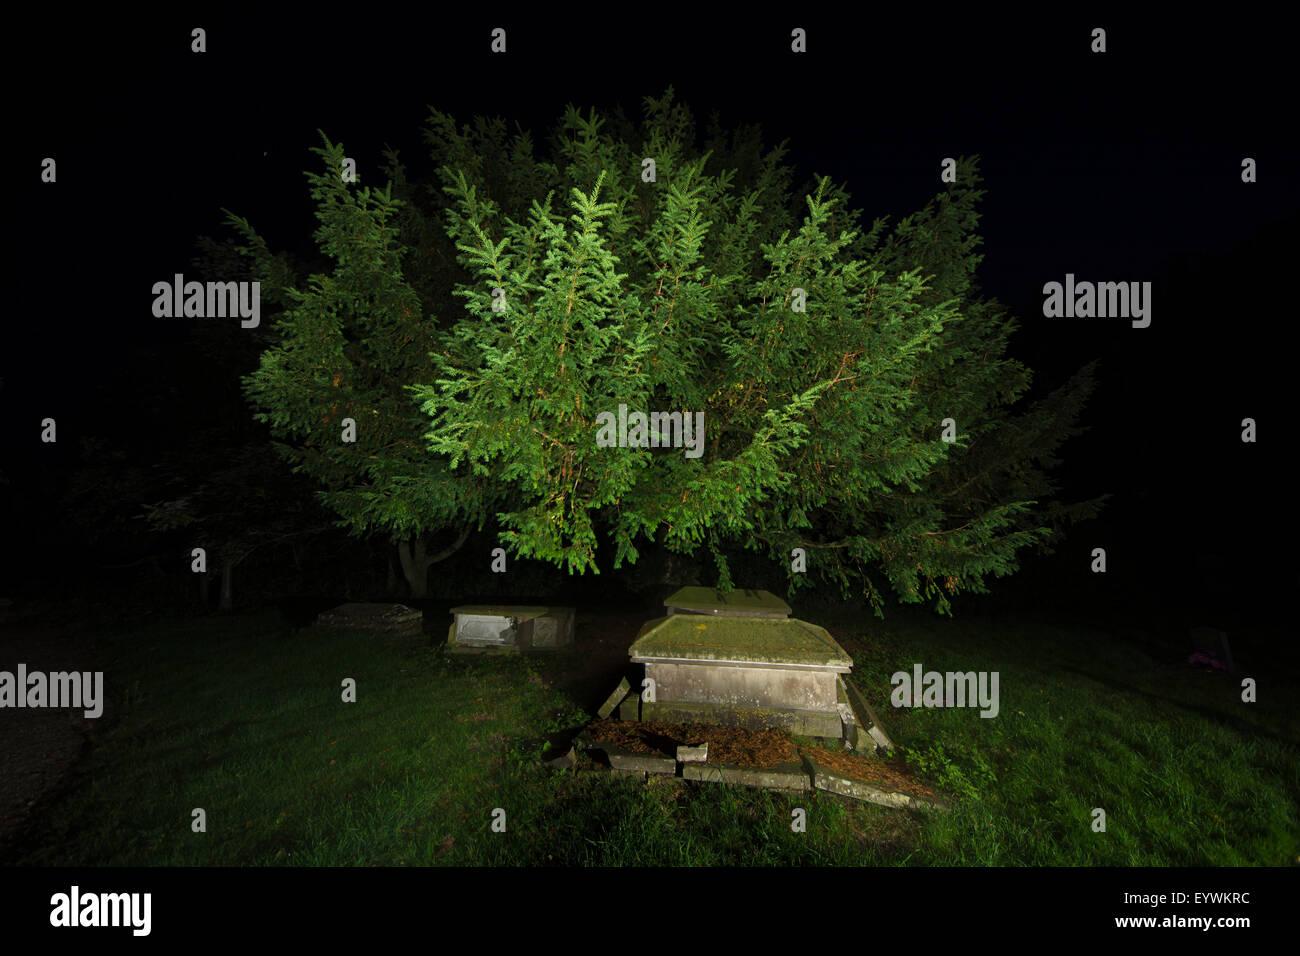 Church yard graveyard graves yew tree night - Stock Image